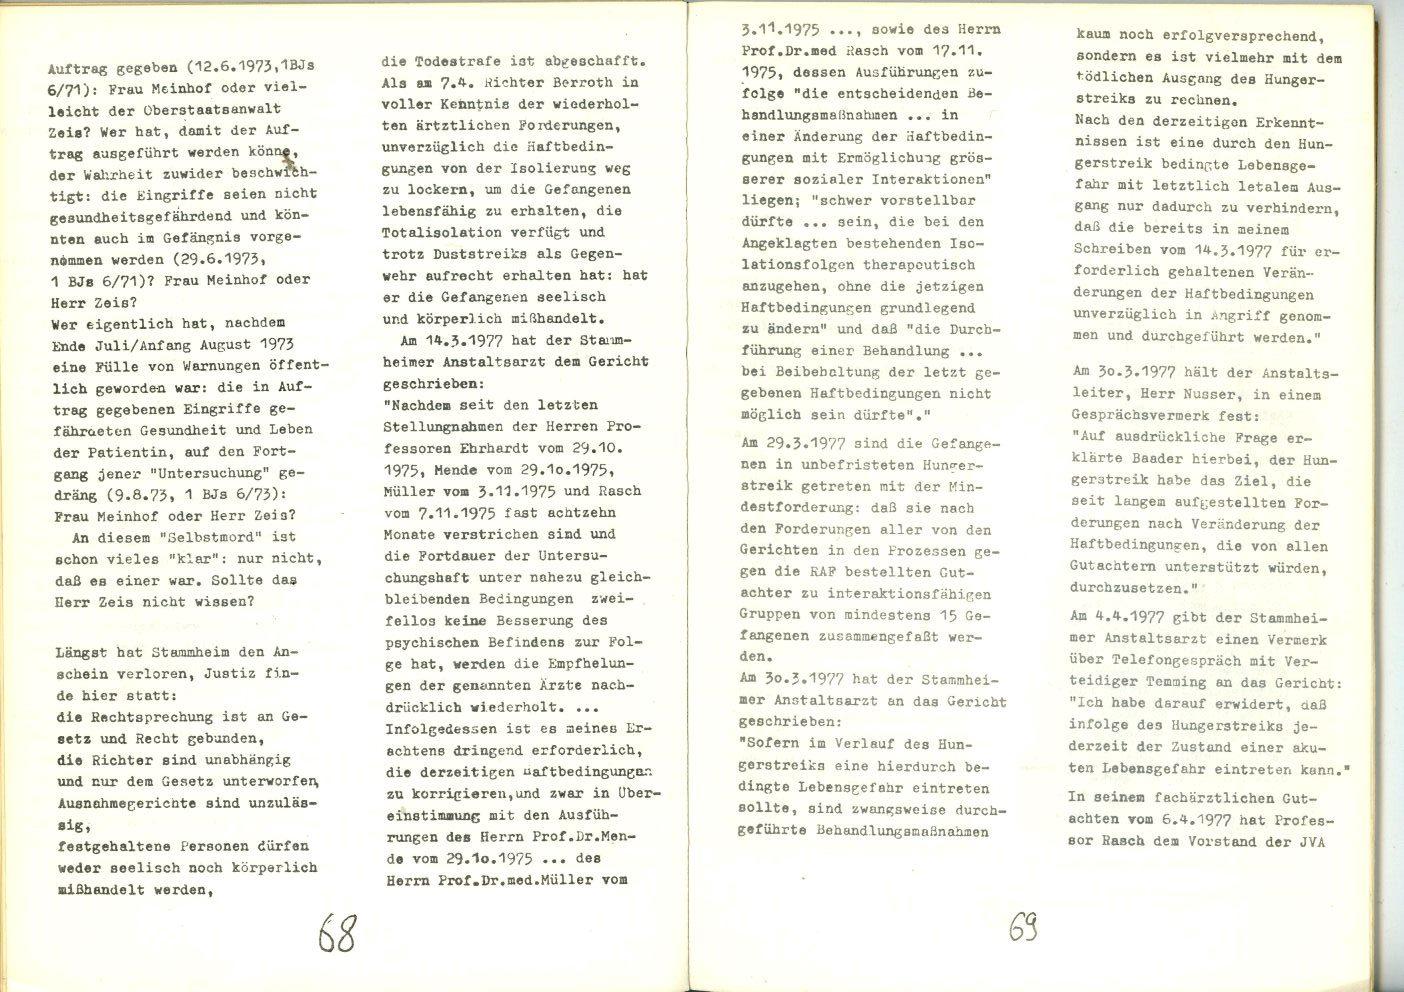 Marburg_Russell_Initiative_1978_36